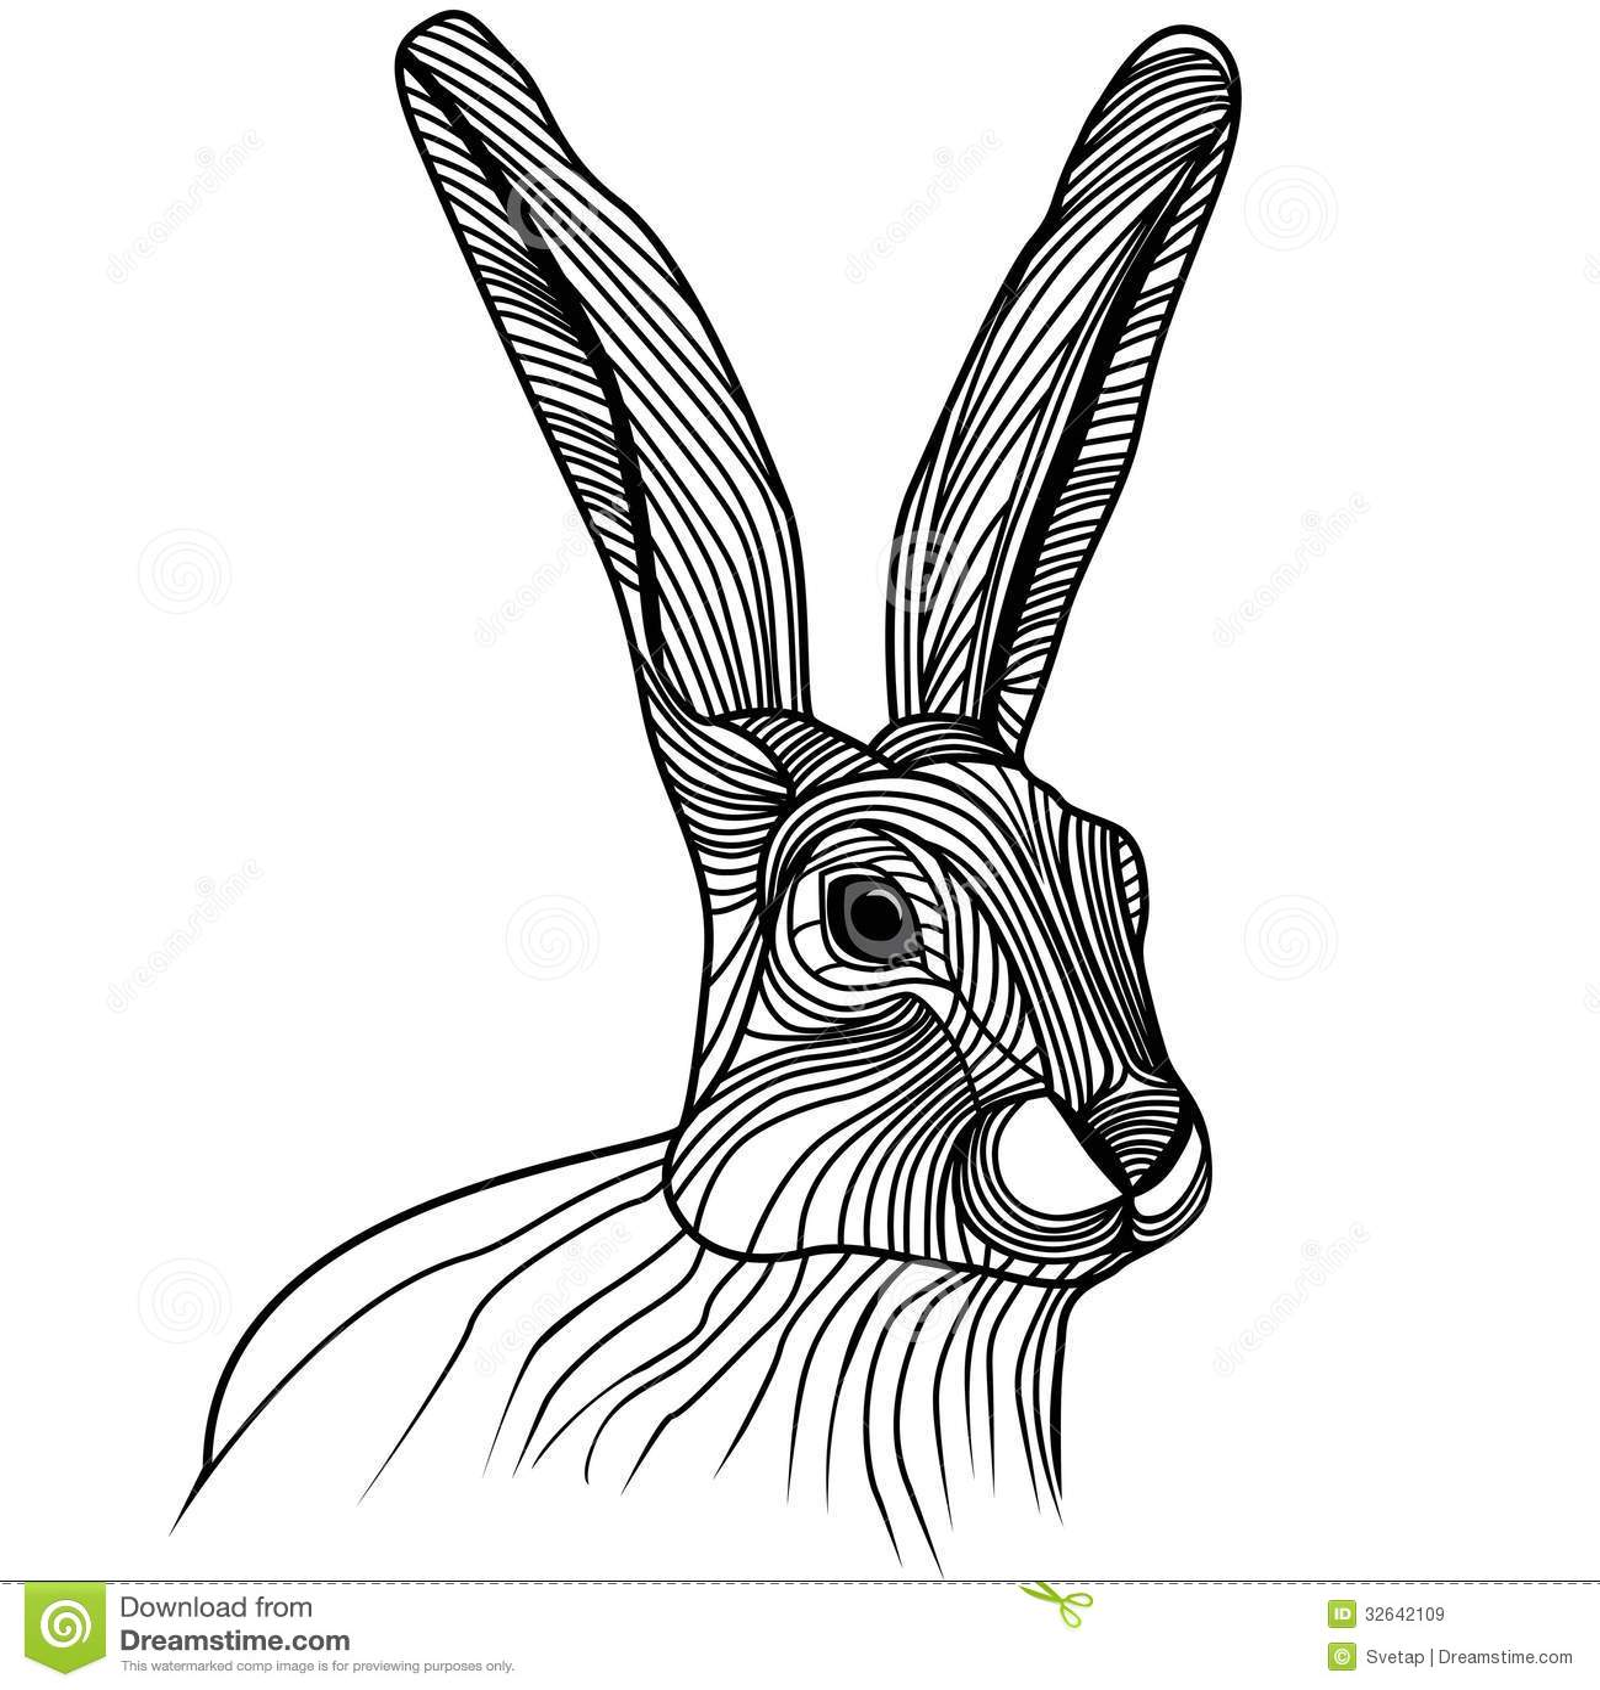 Rabbit Or Hare Head Vector Illustration Royalty Free Stock